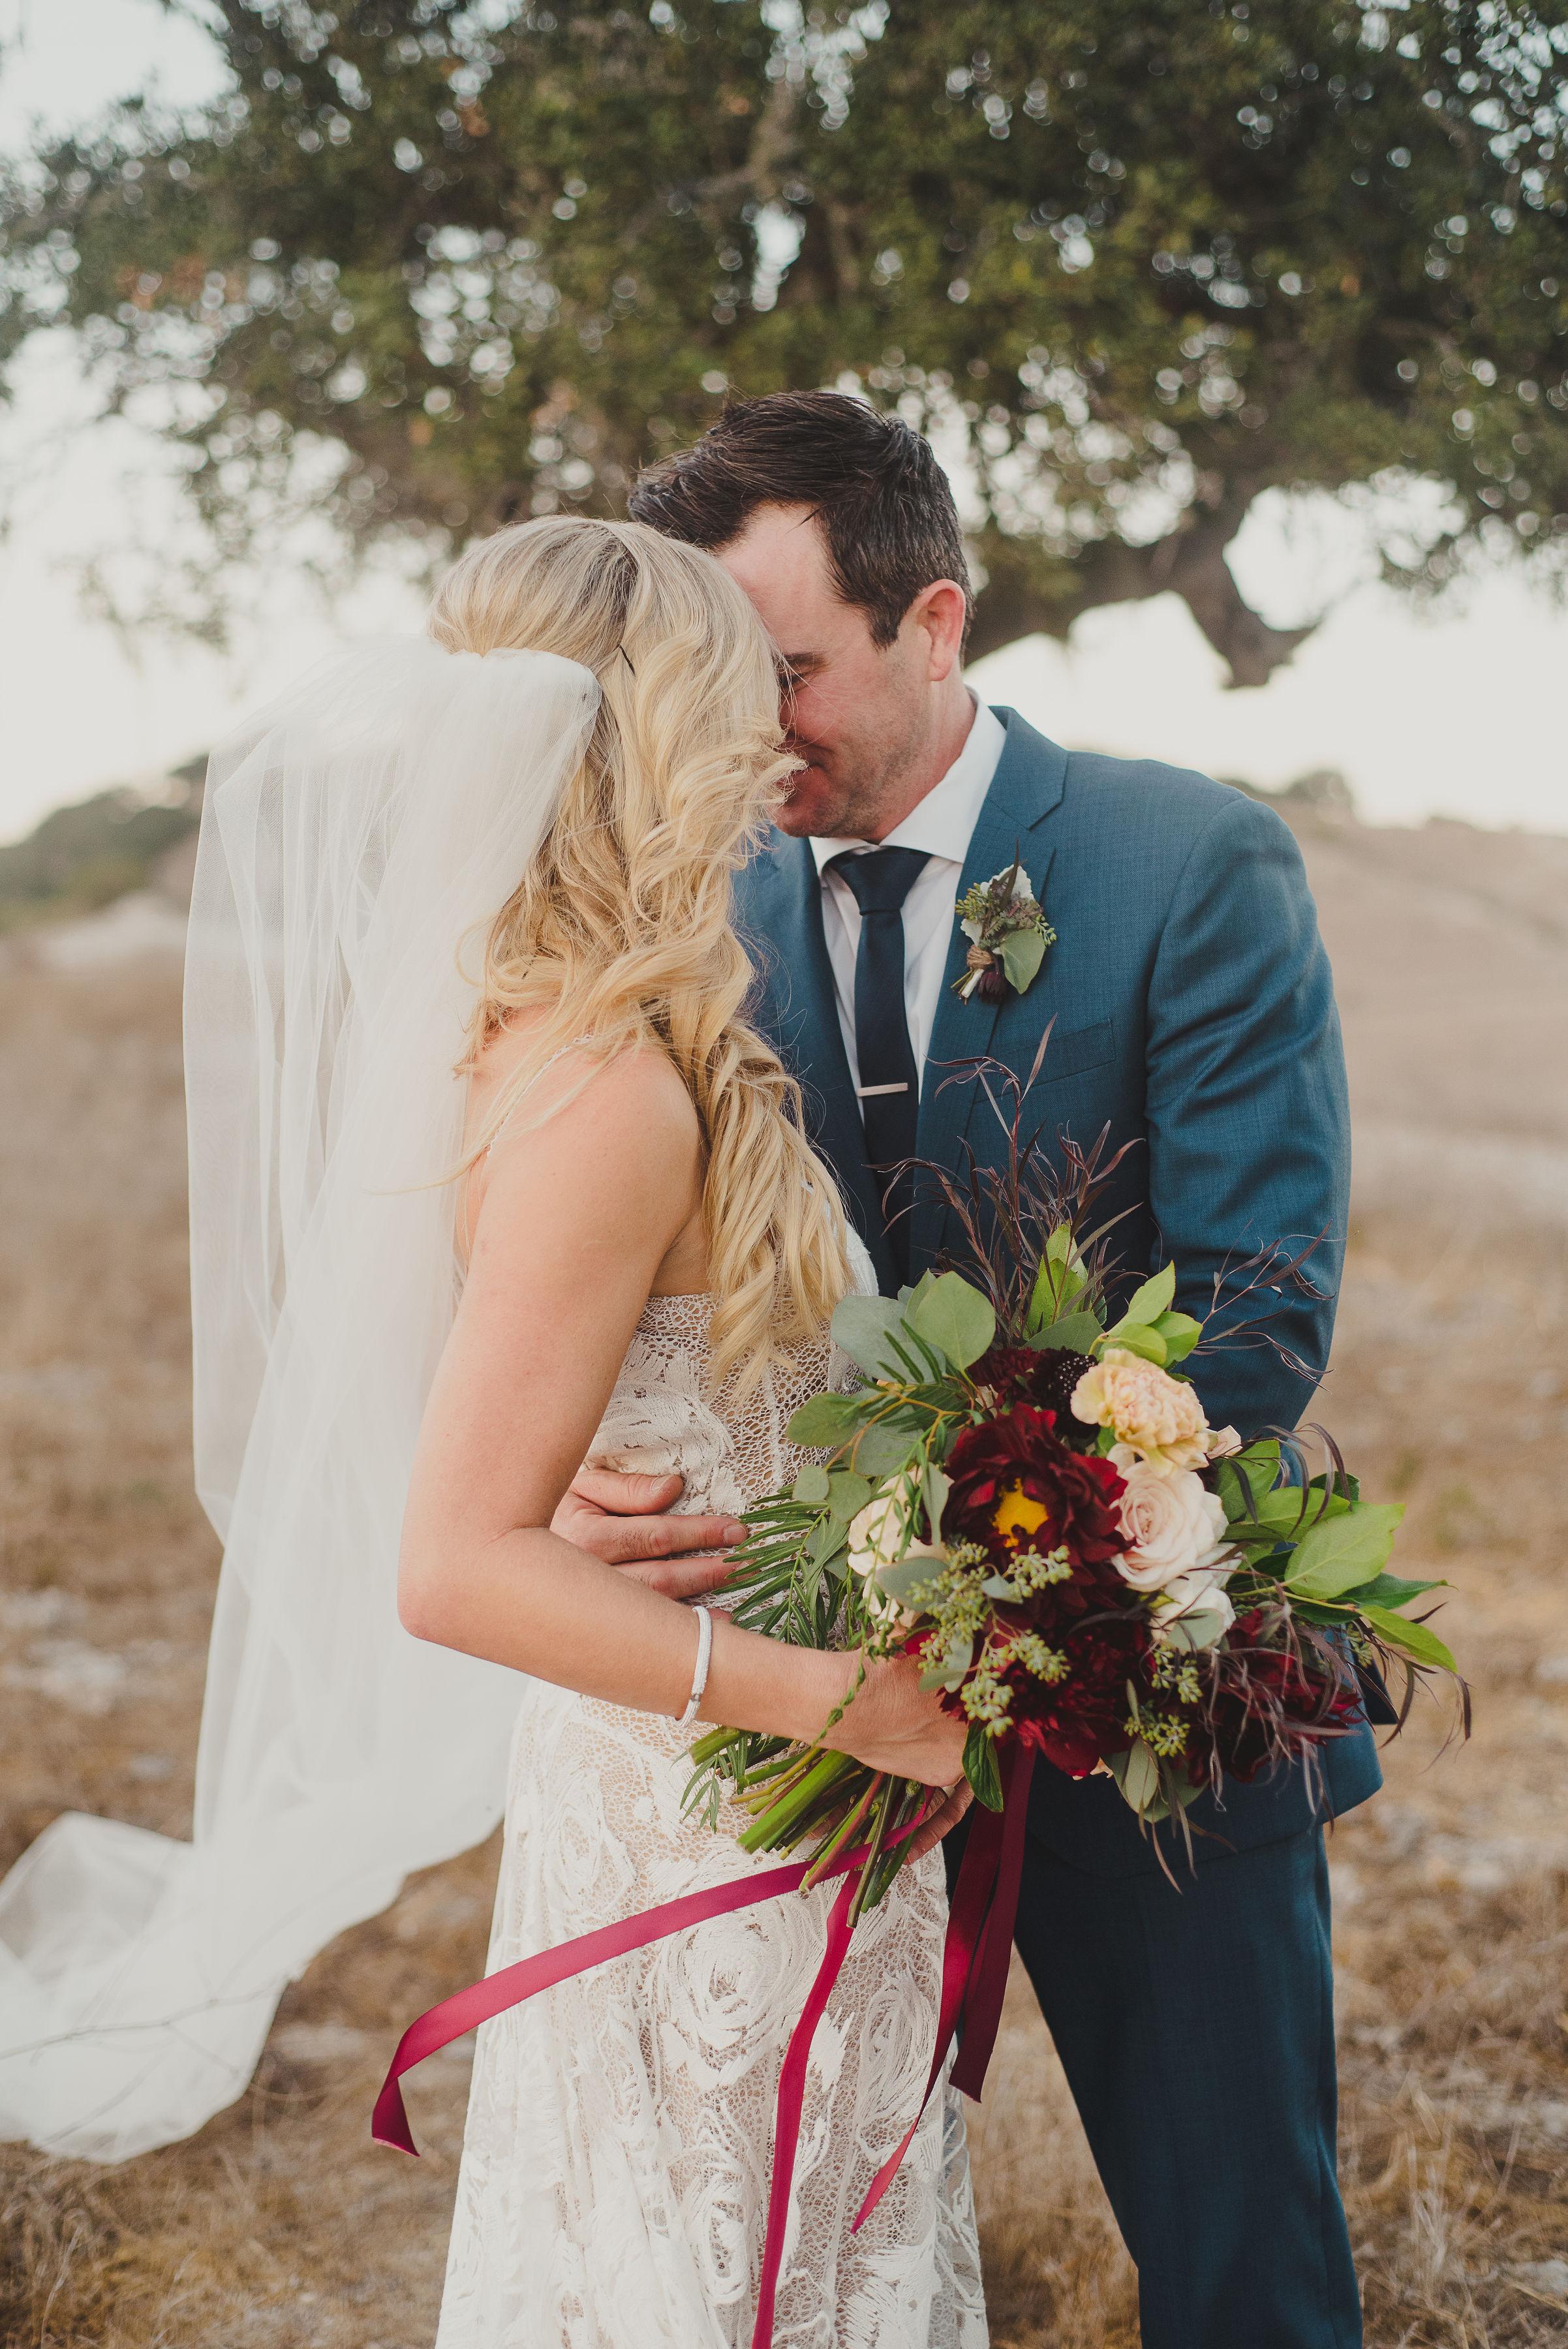 181026-Marisa-JB-Wedding-5378.jpg